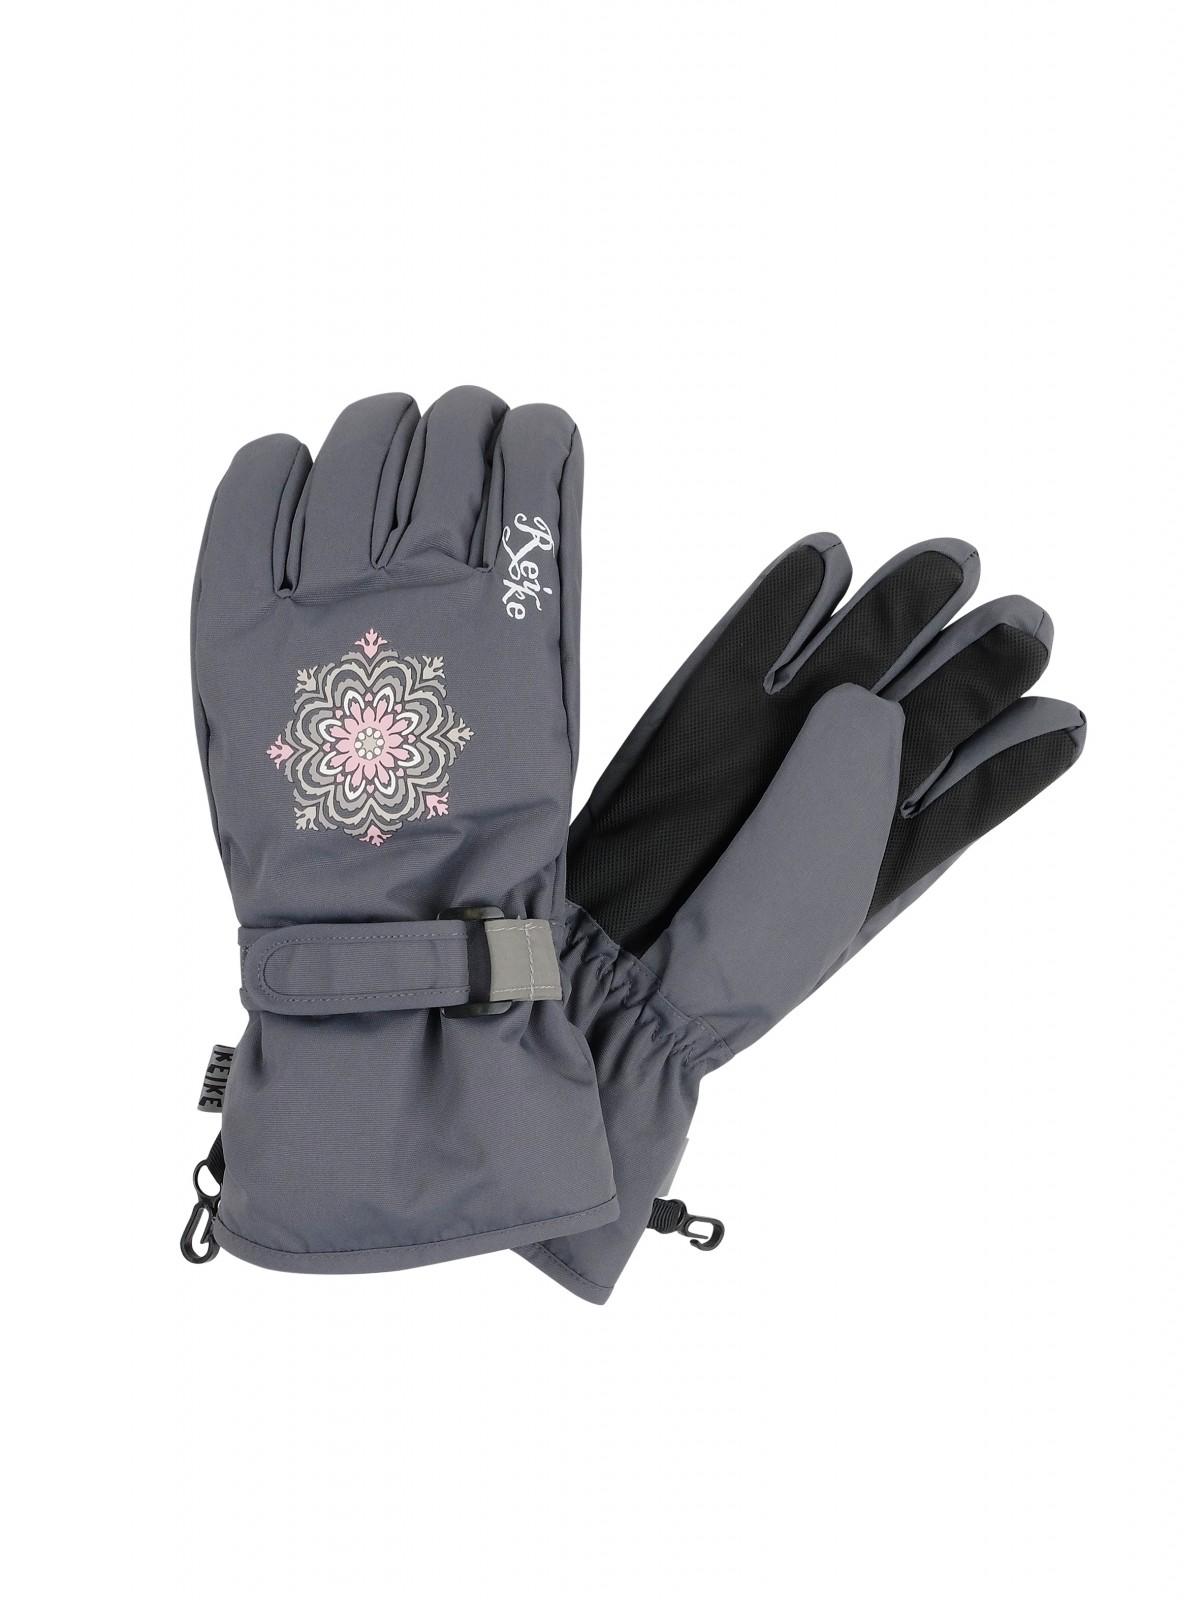 Перчатки для девочки Reike